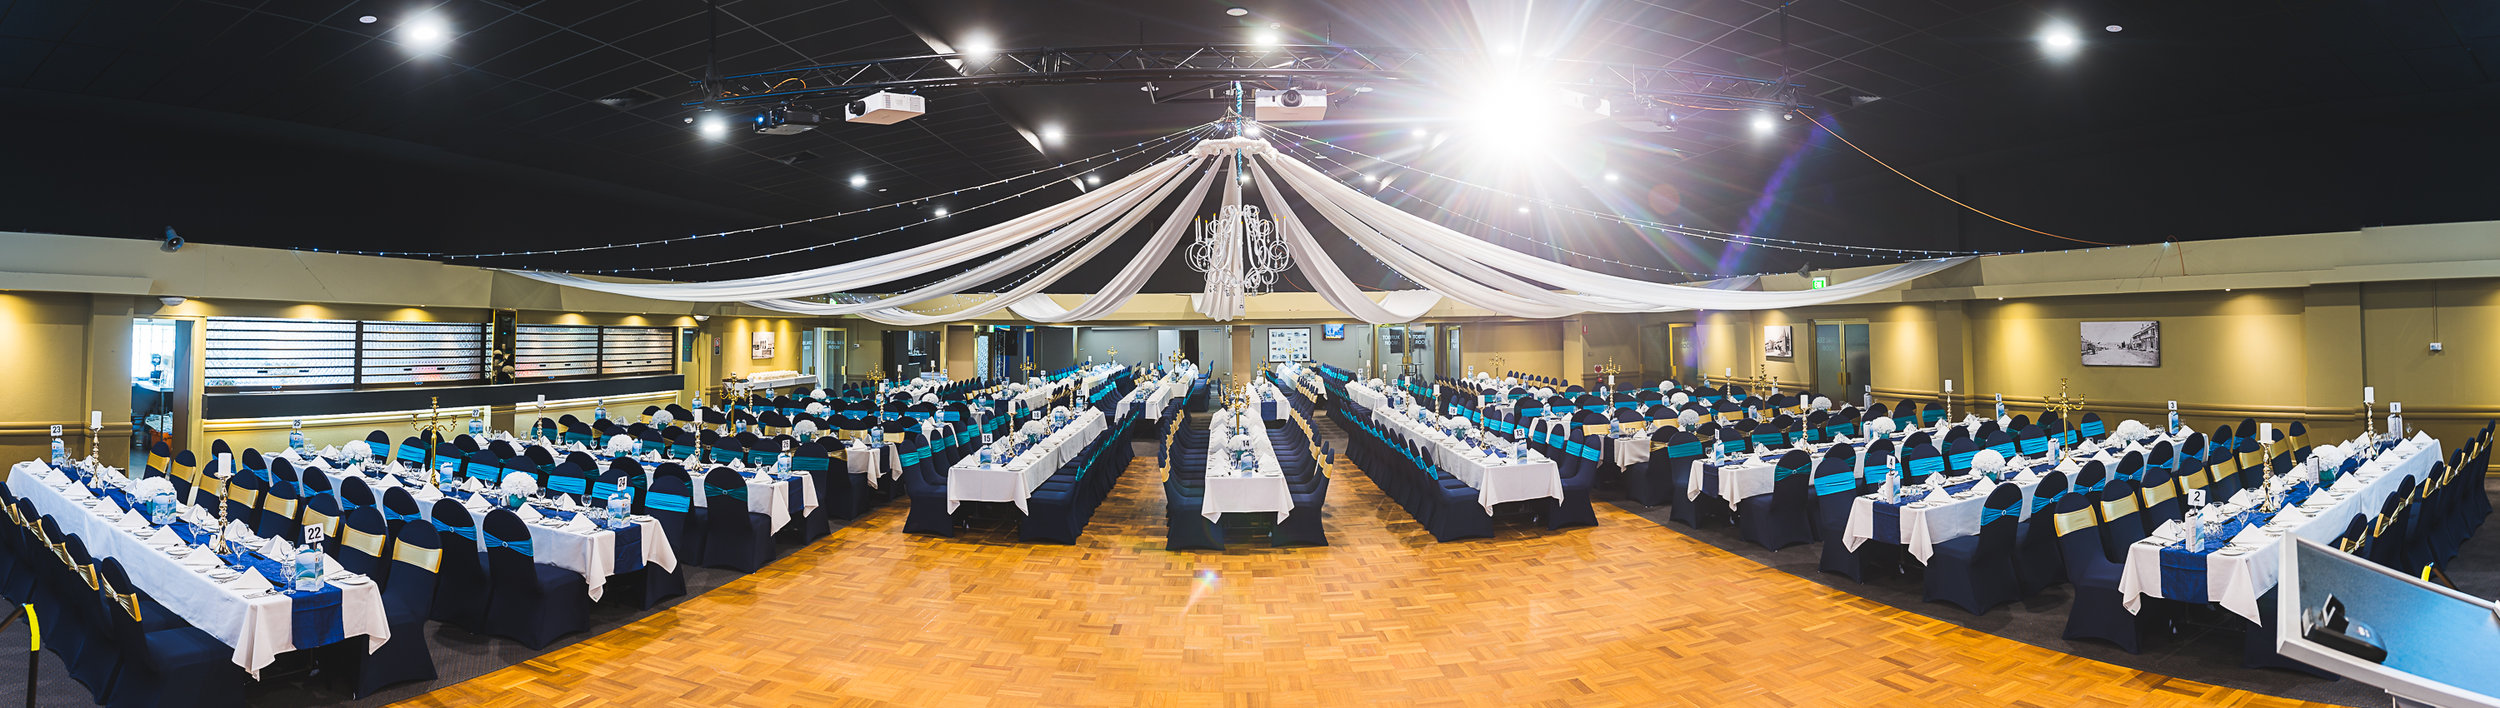 Coral Sea Auditorium Wedding 3 Pano.jpg